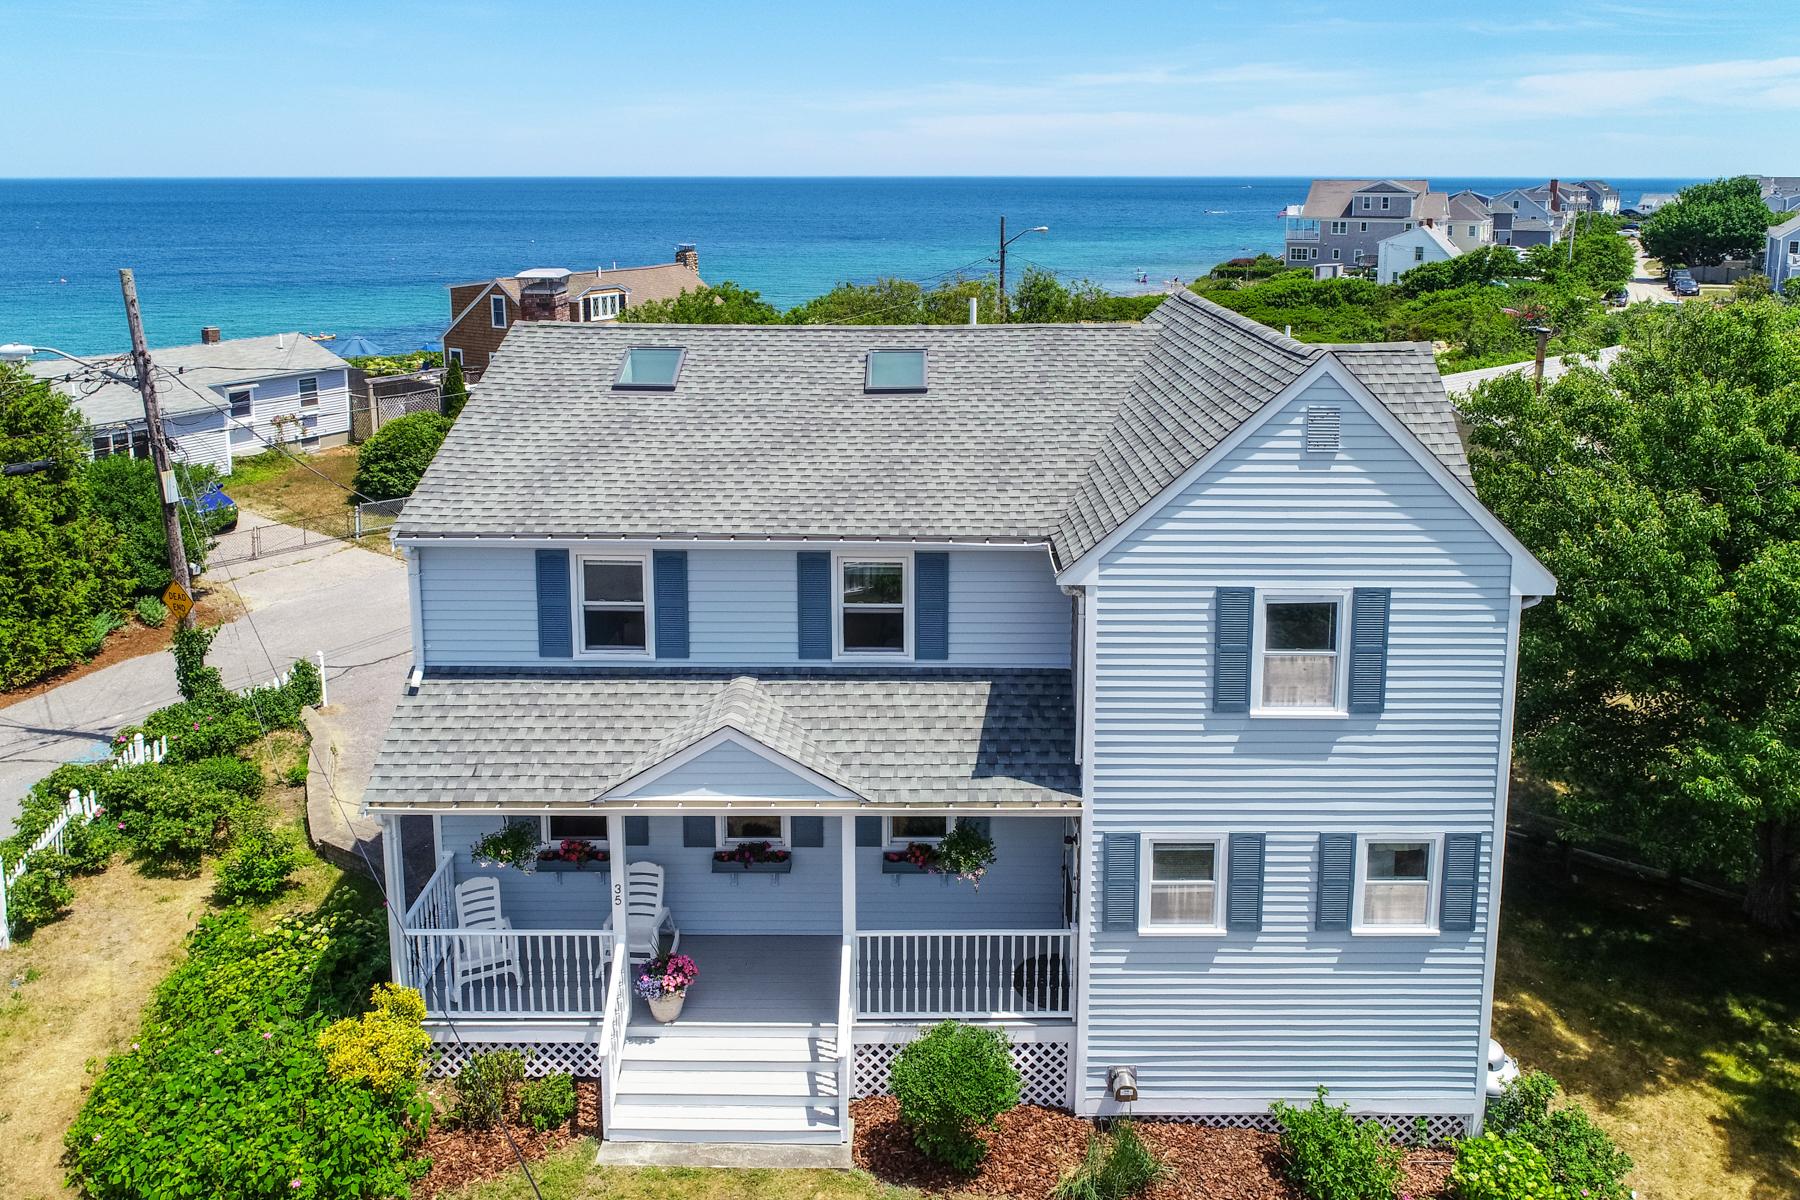 Single Family Homes 为 销售 在 35 Cape View Dr 普利茅斯, 马萨诸塞州 02360 美国